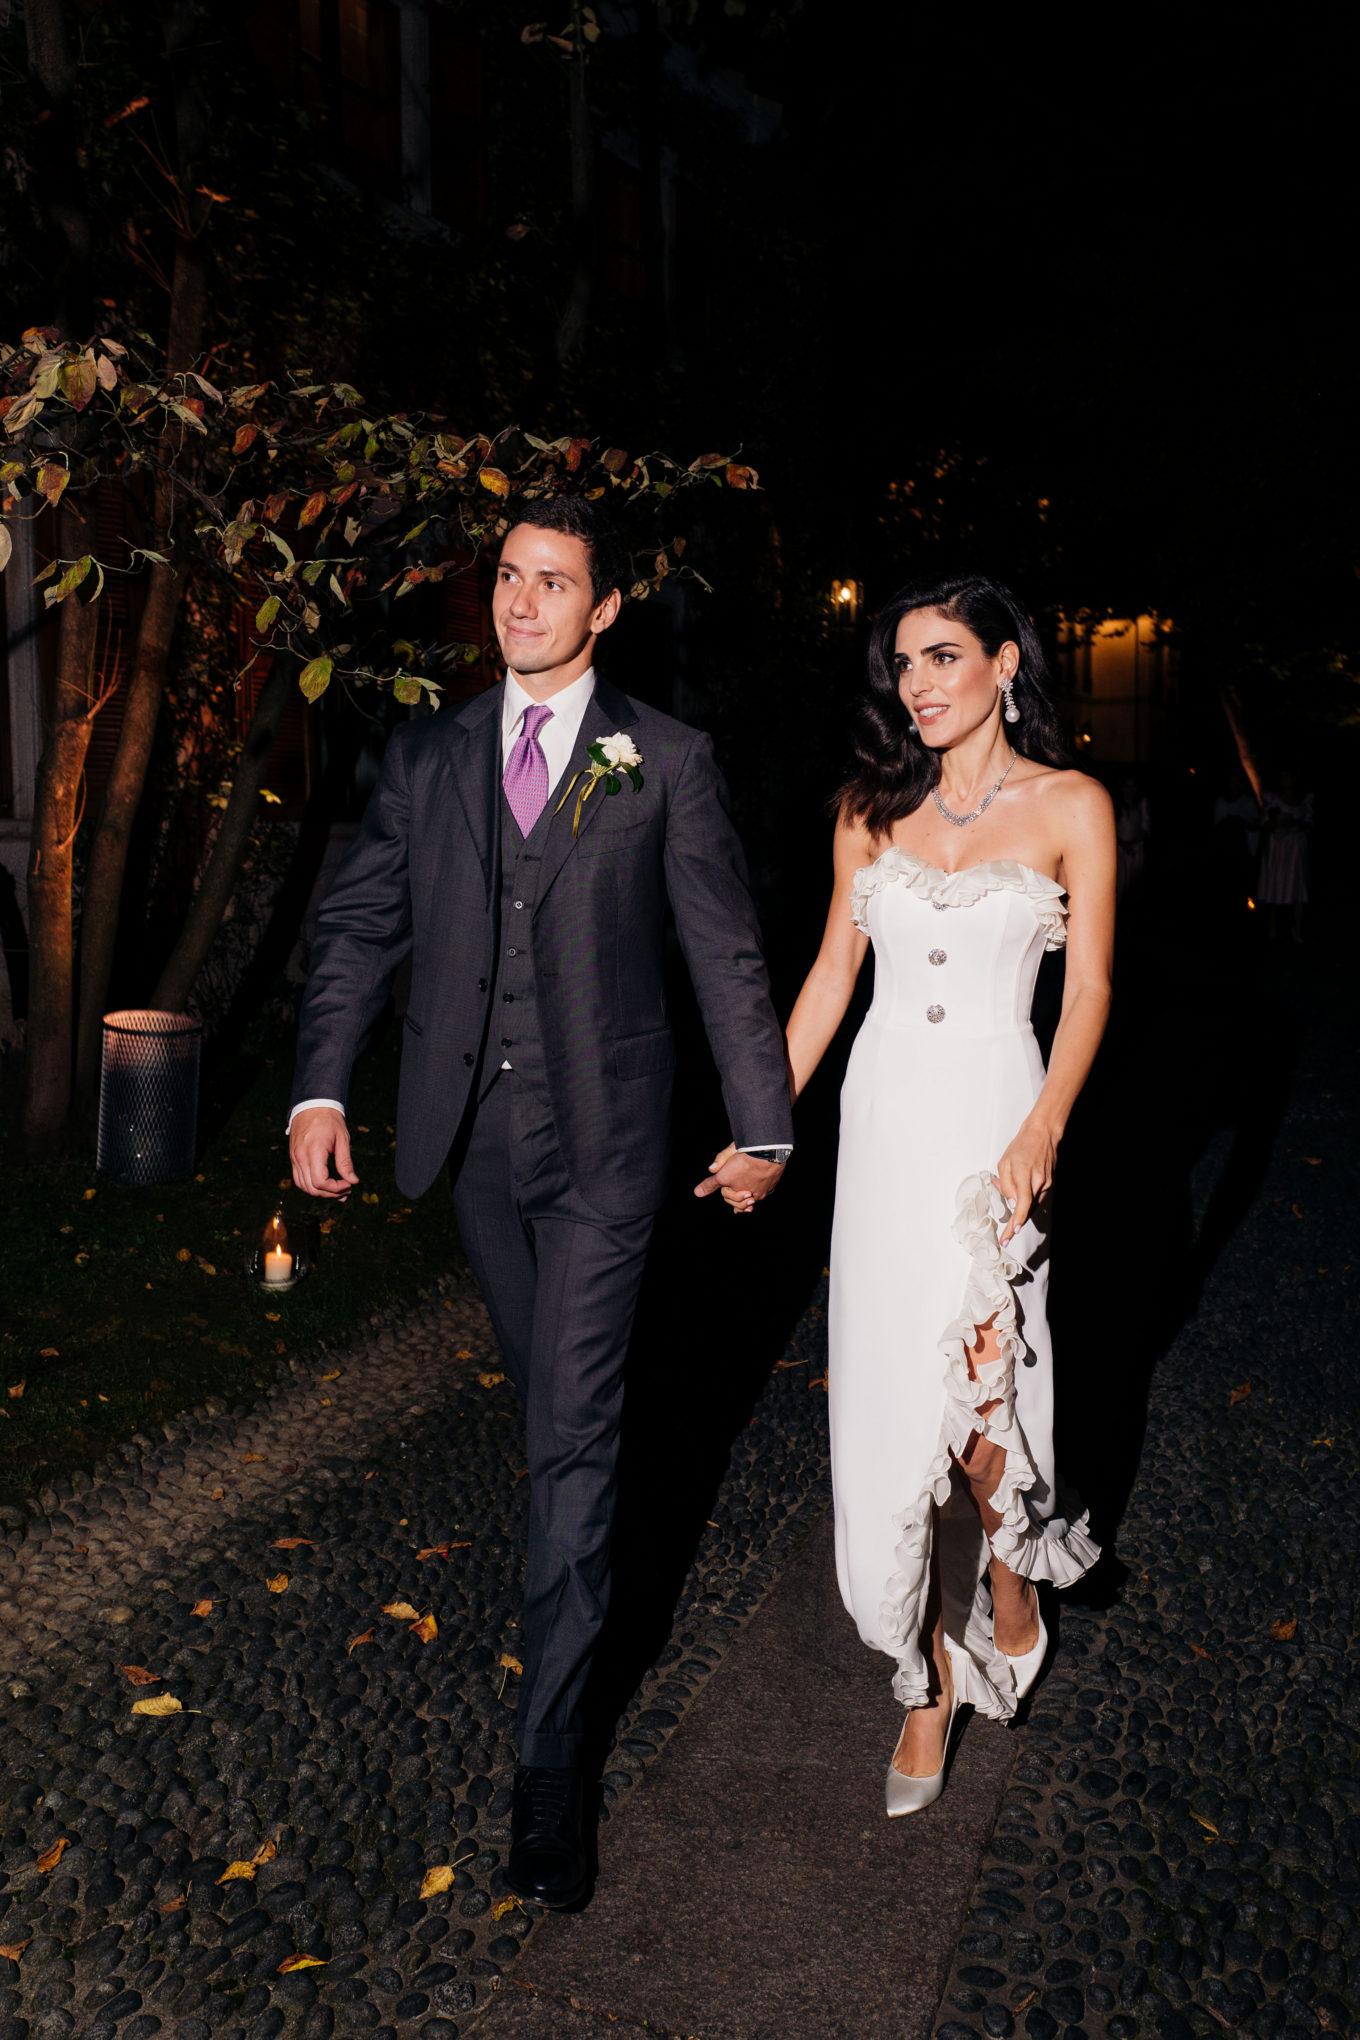 Wedding Day: младший сын Сильвио Берлускони Луиджи женился